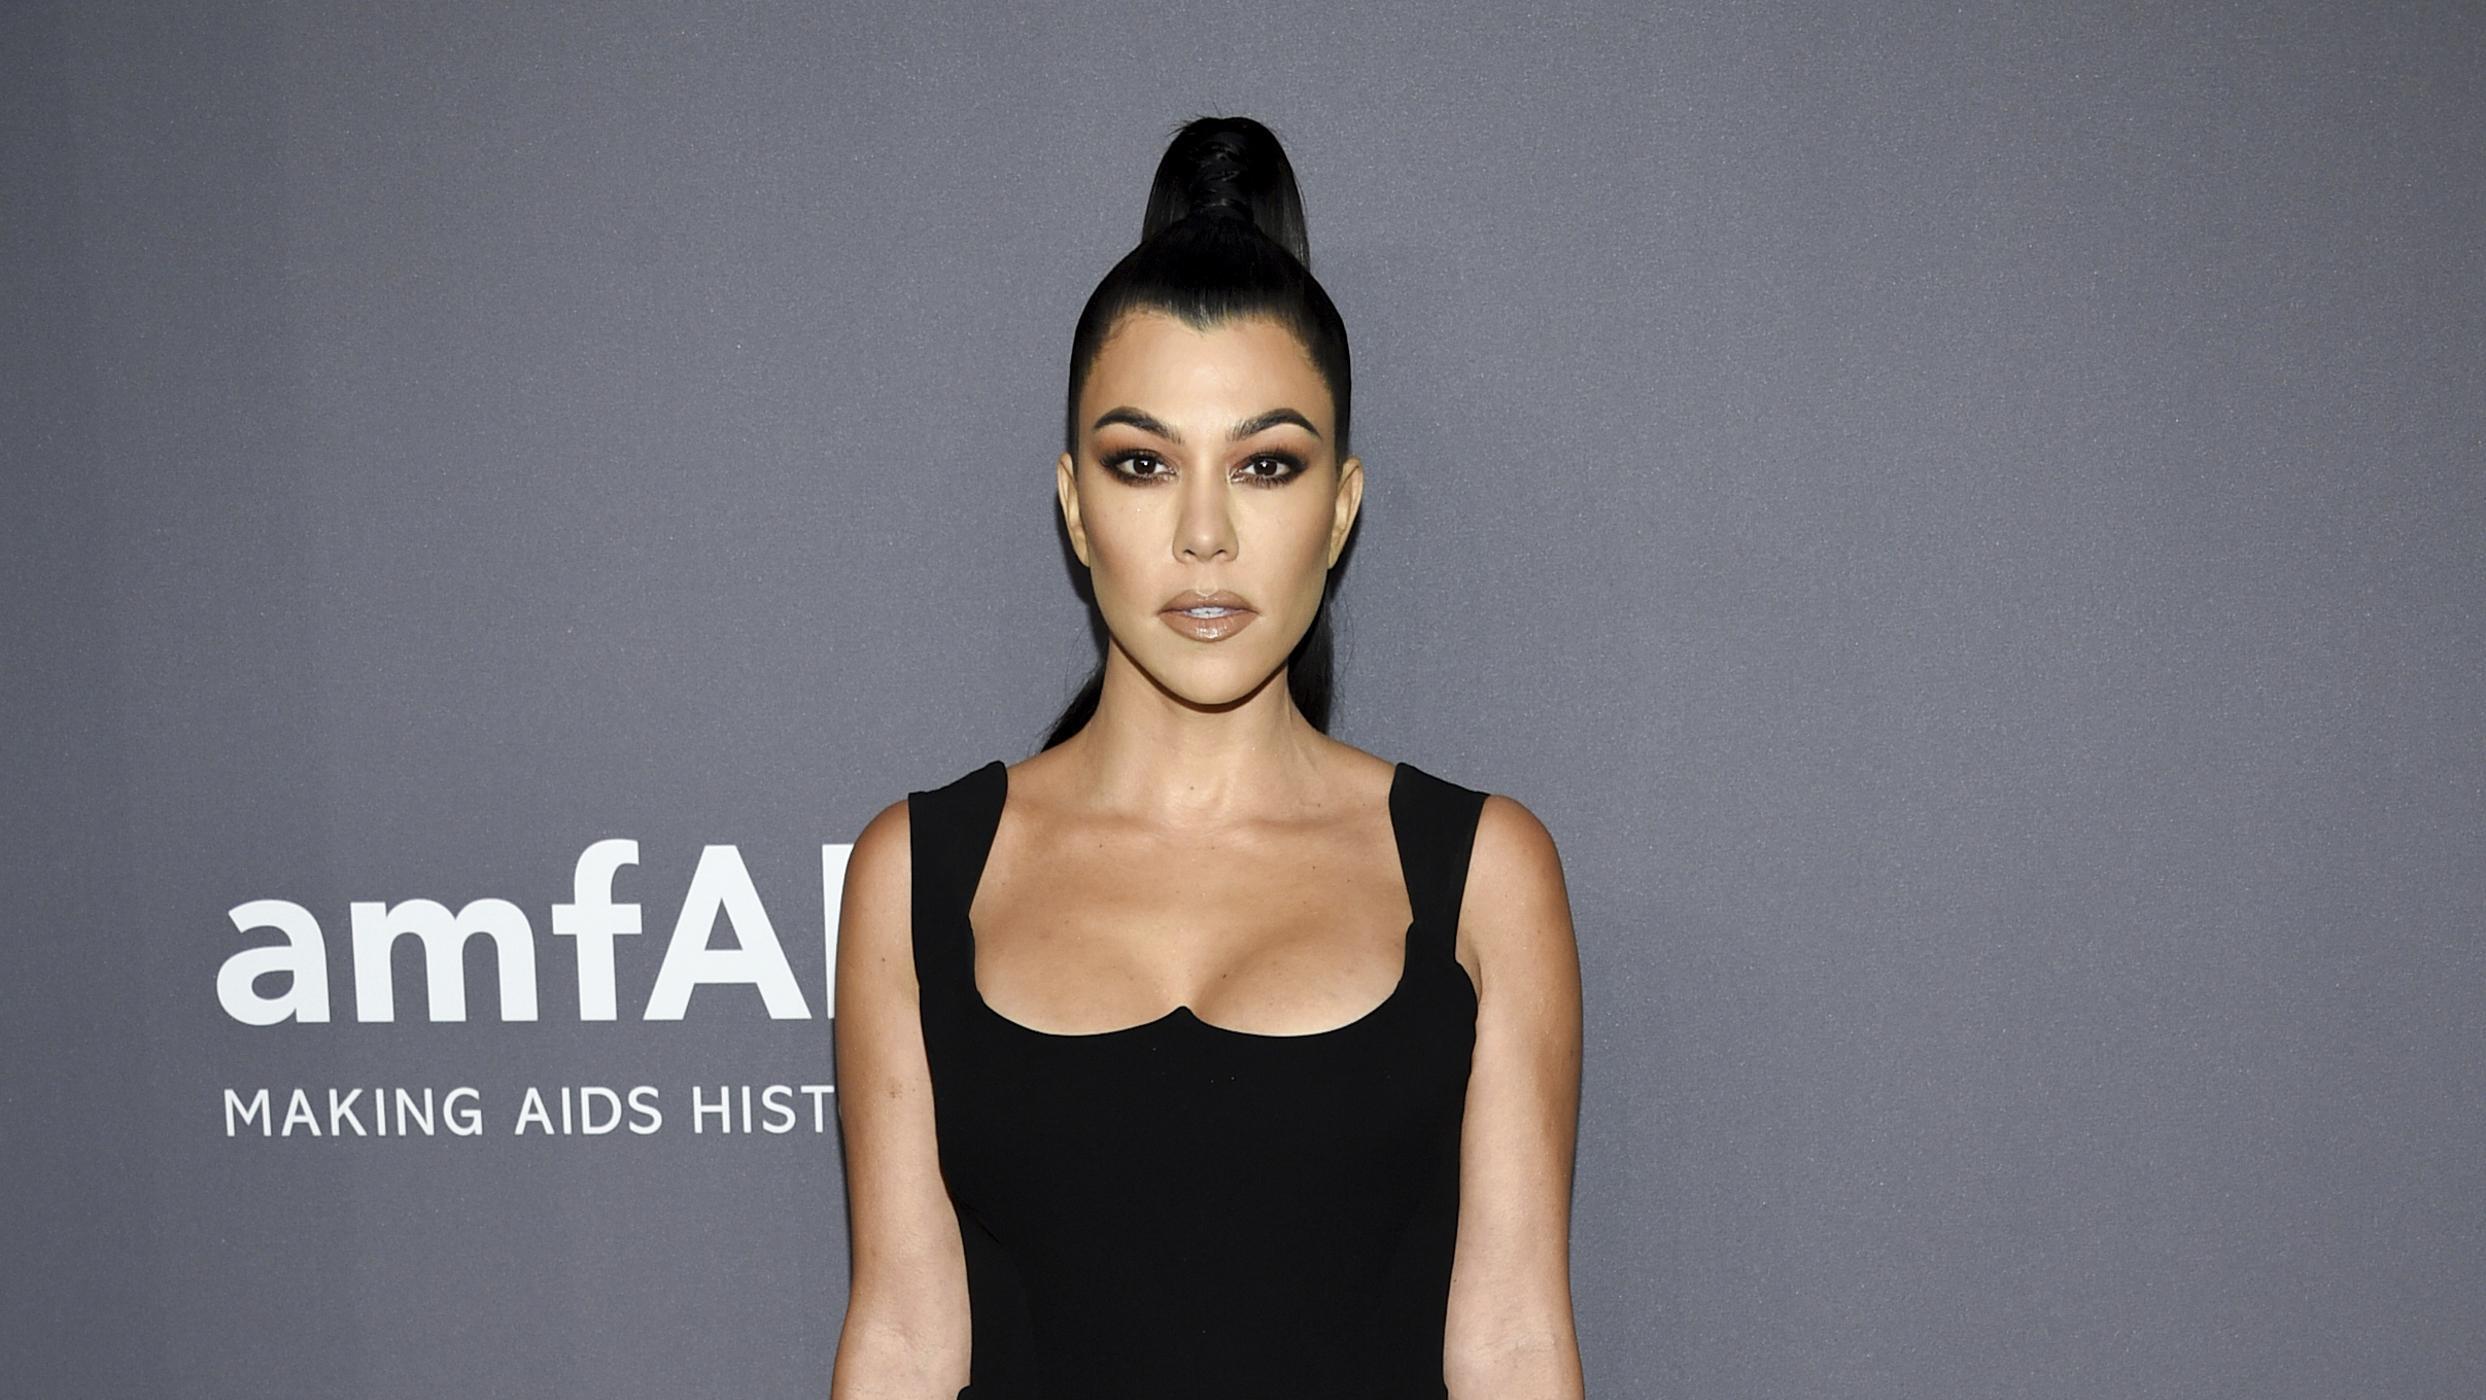 Khloe Kardashian dating geschiedenis beste aansluiting sites Calgary